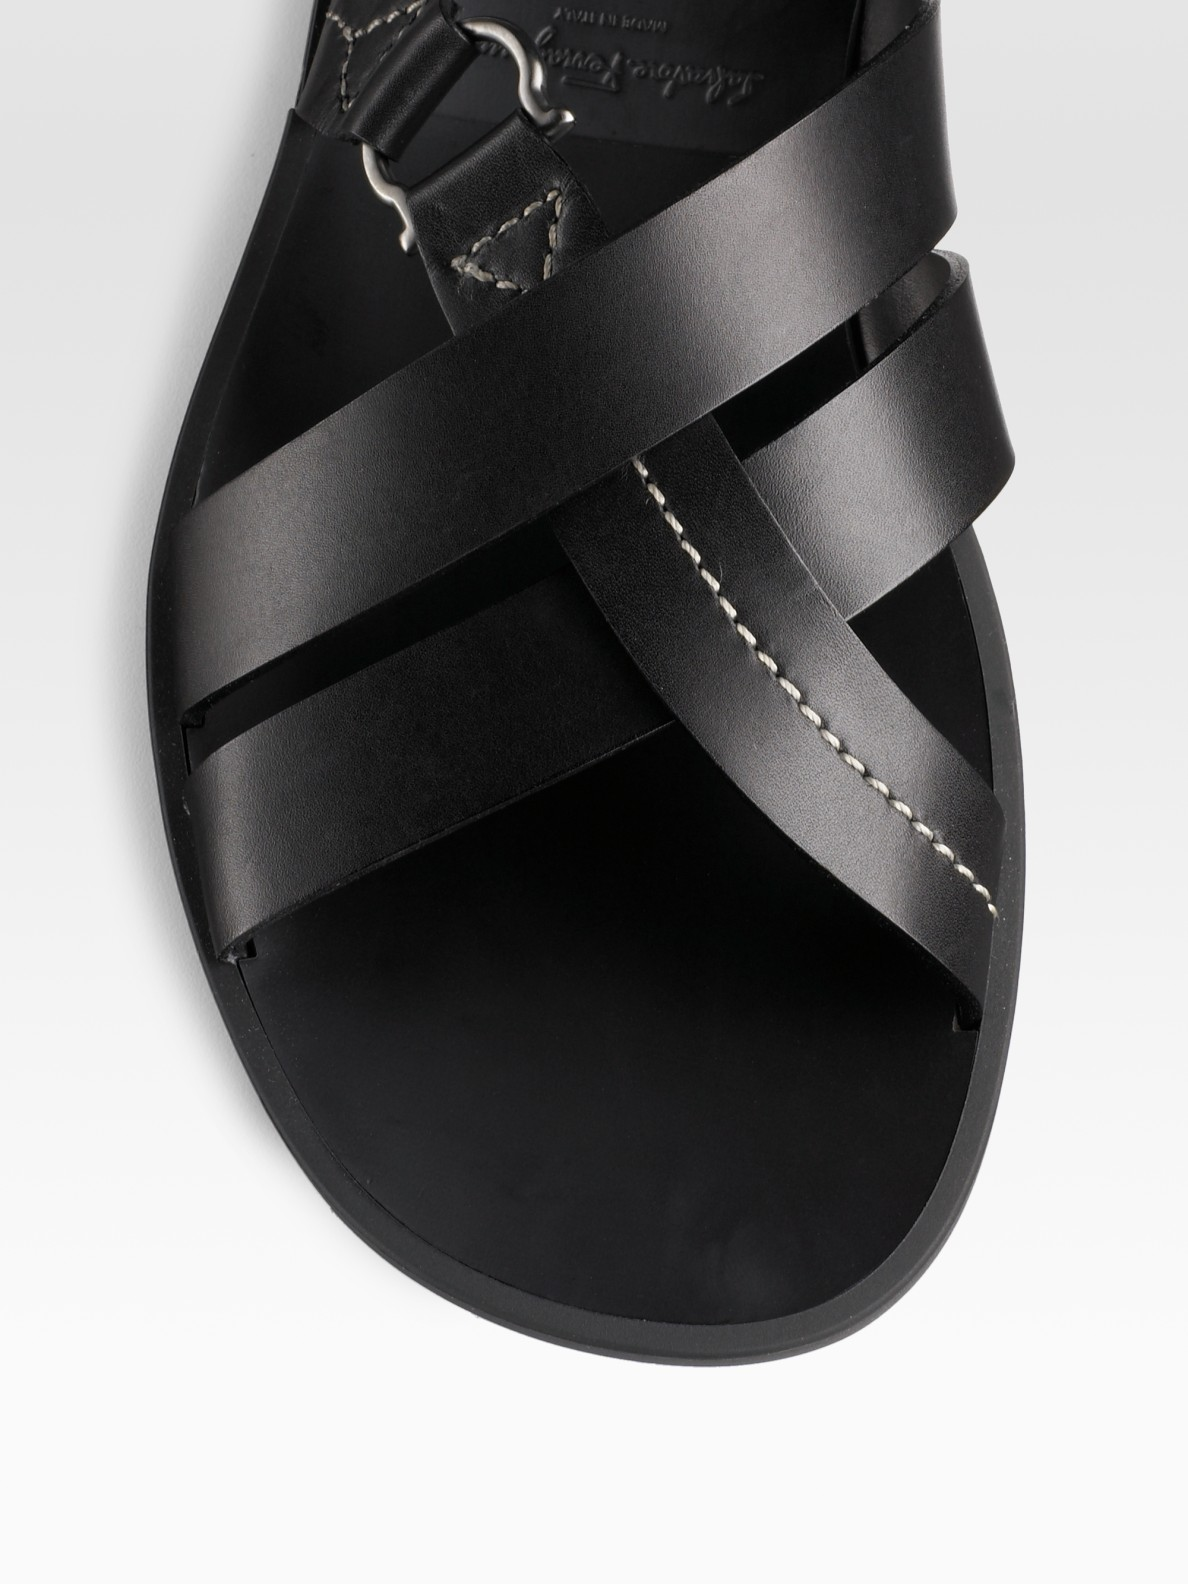 Lyst Ferragamo Leather Sandals In Black For Men